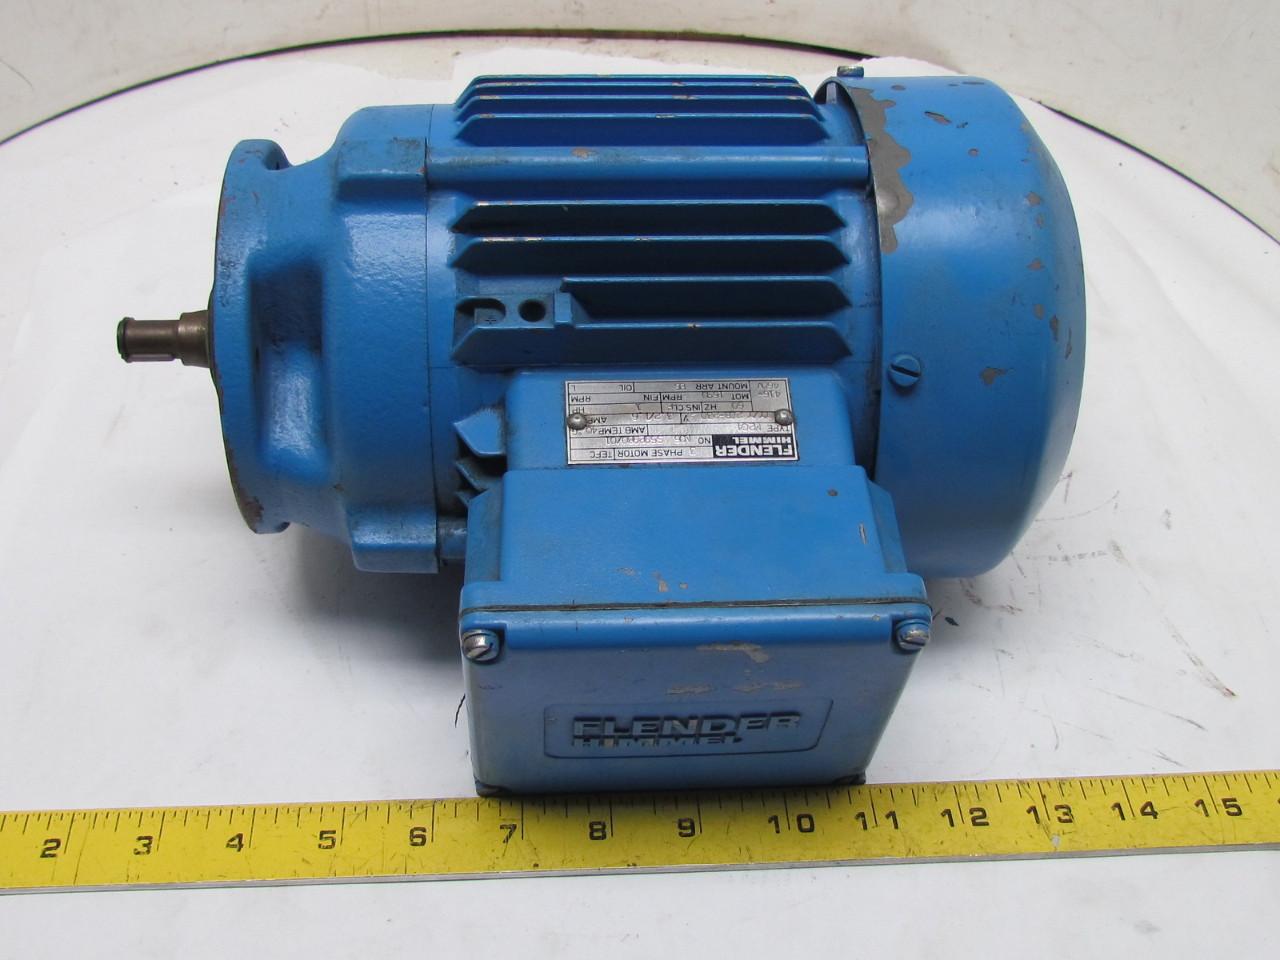 Flender himmel m2c4 3 phase ac motor 1hp 1690 rpm 208 230 for 1 4 hp 3 phase motor